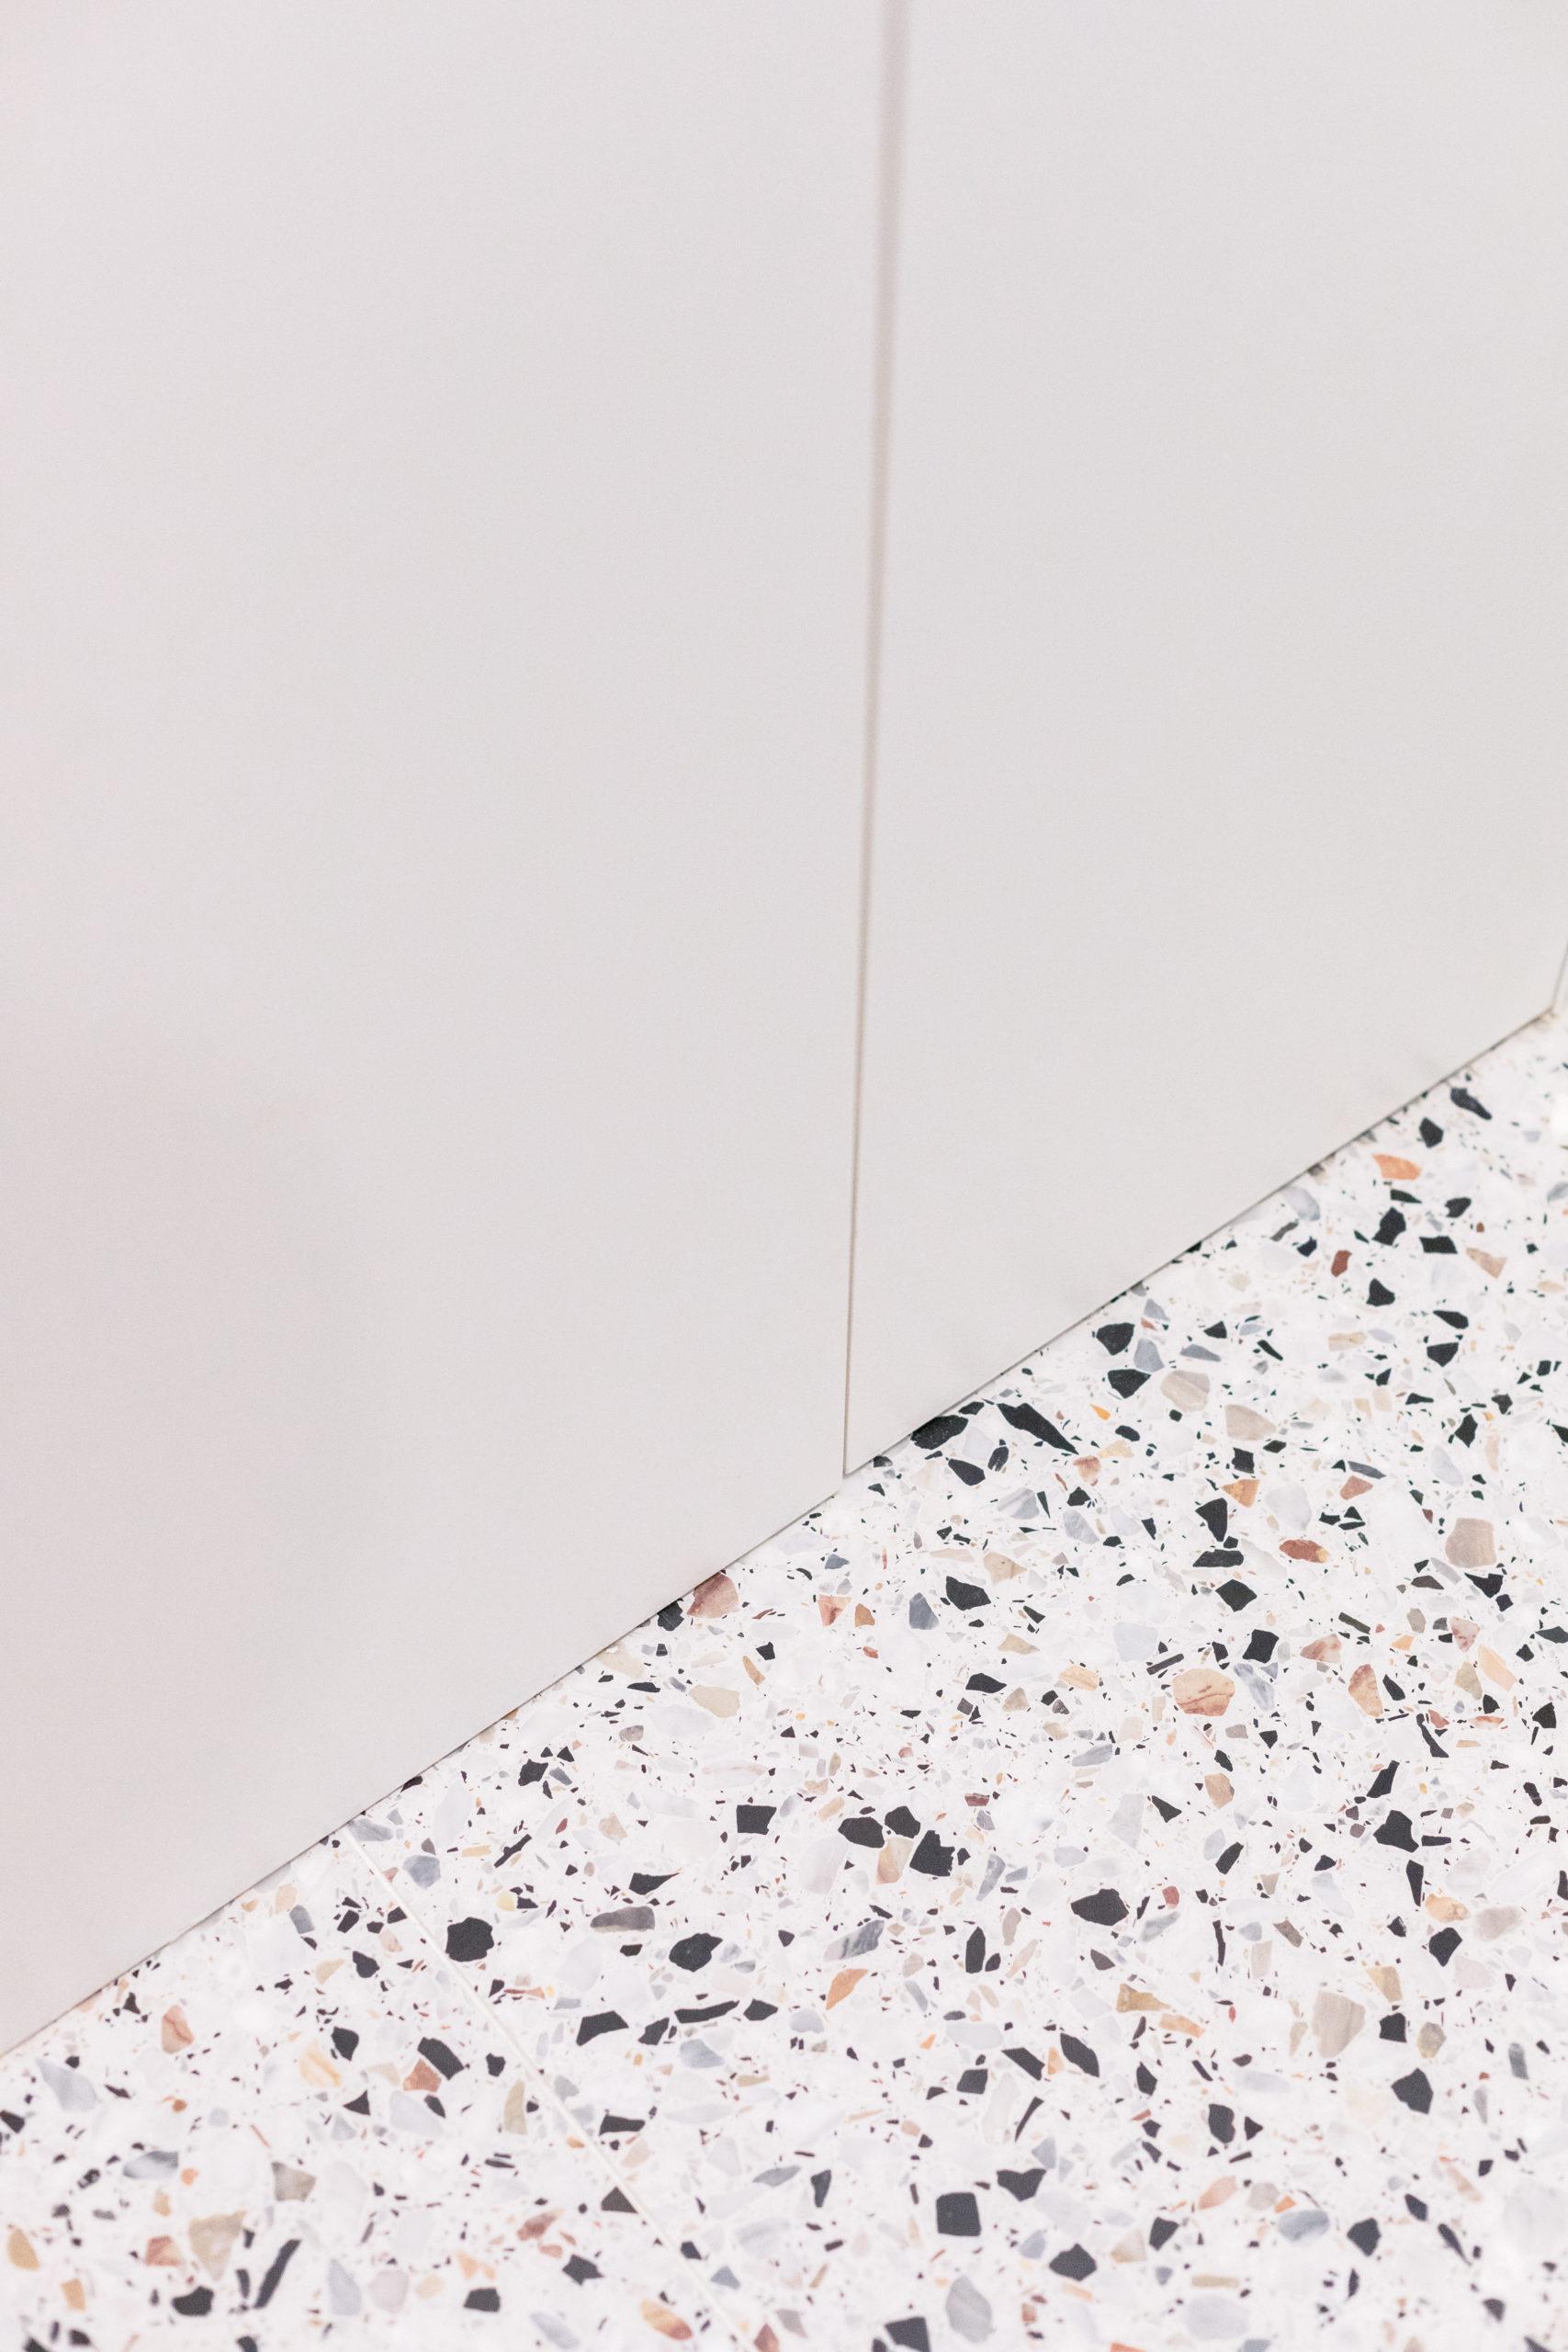 Sol terrazzo - Architecte intérieur Studio Mariekke - Paris